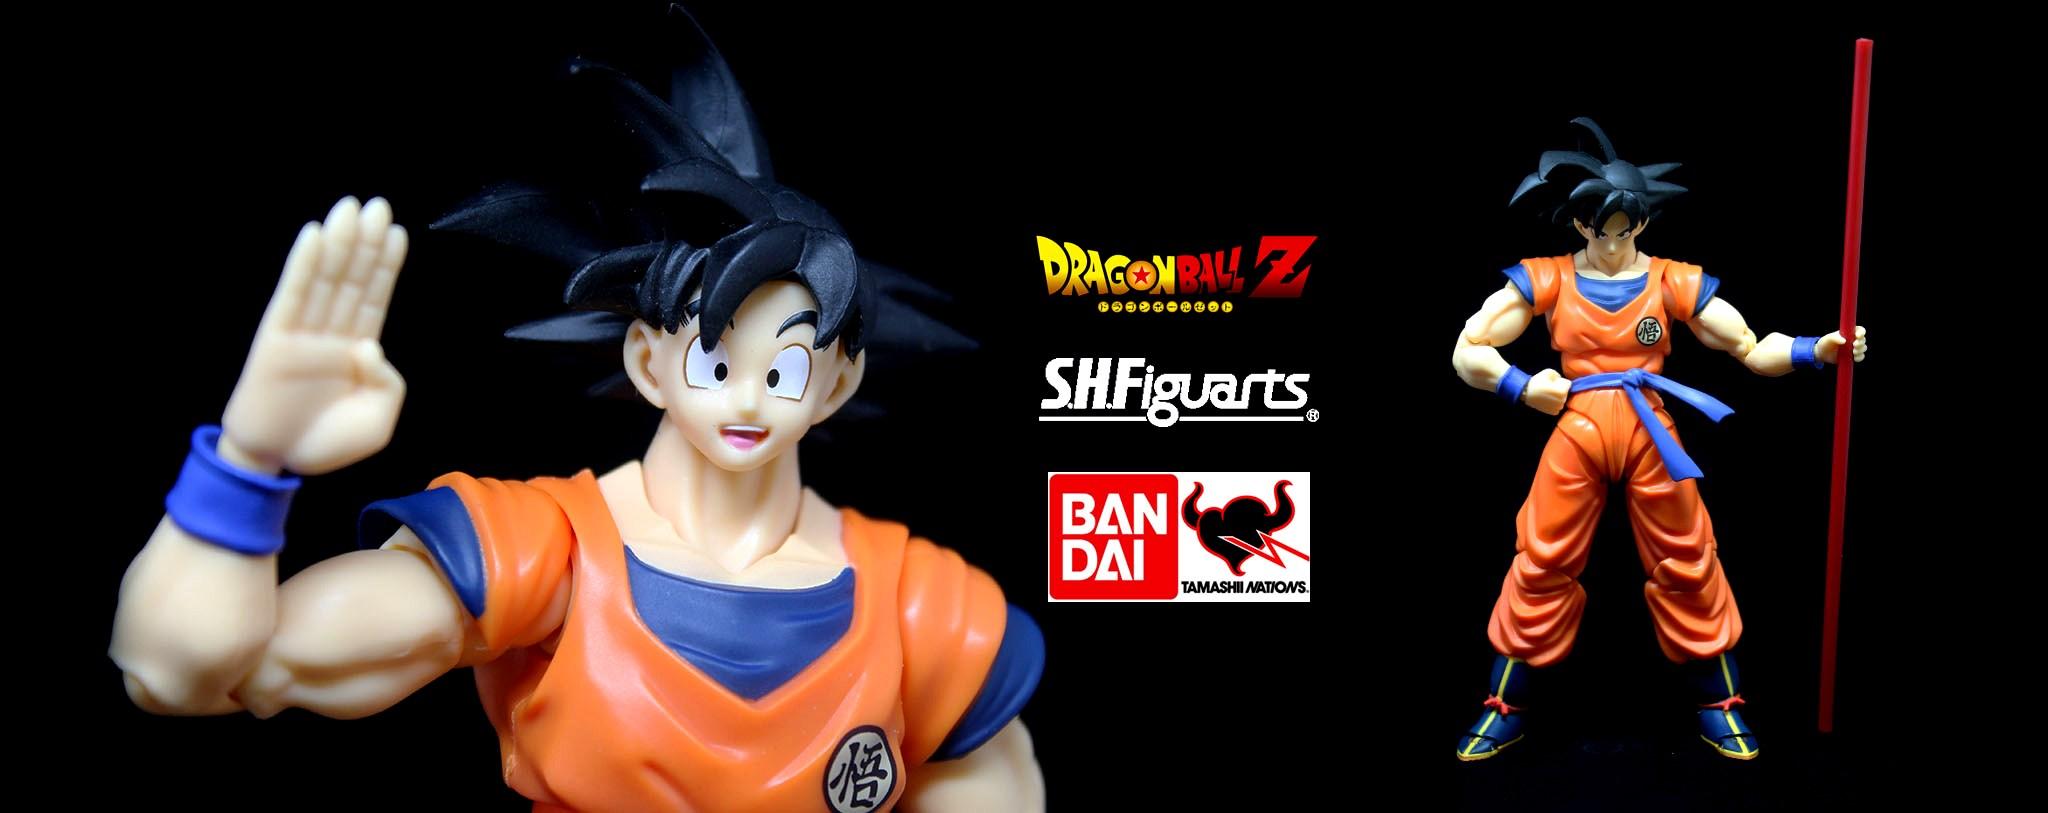 Recensione: Goku a Saiyan Raised on Earth S.H. Figuarts di Tamashii Nations